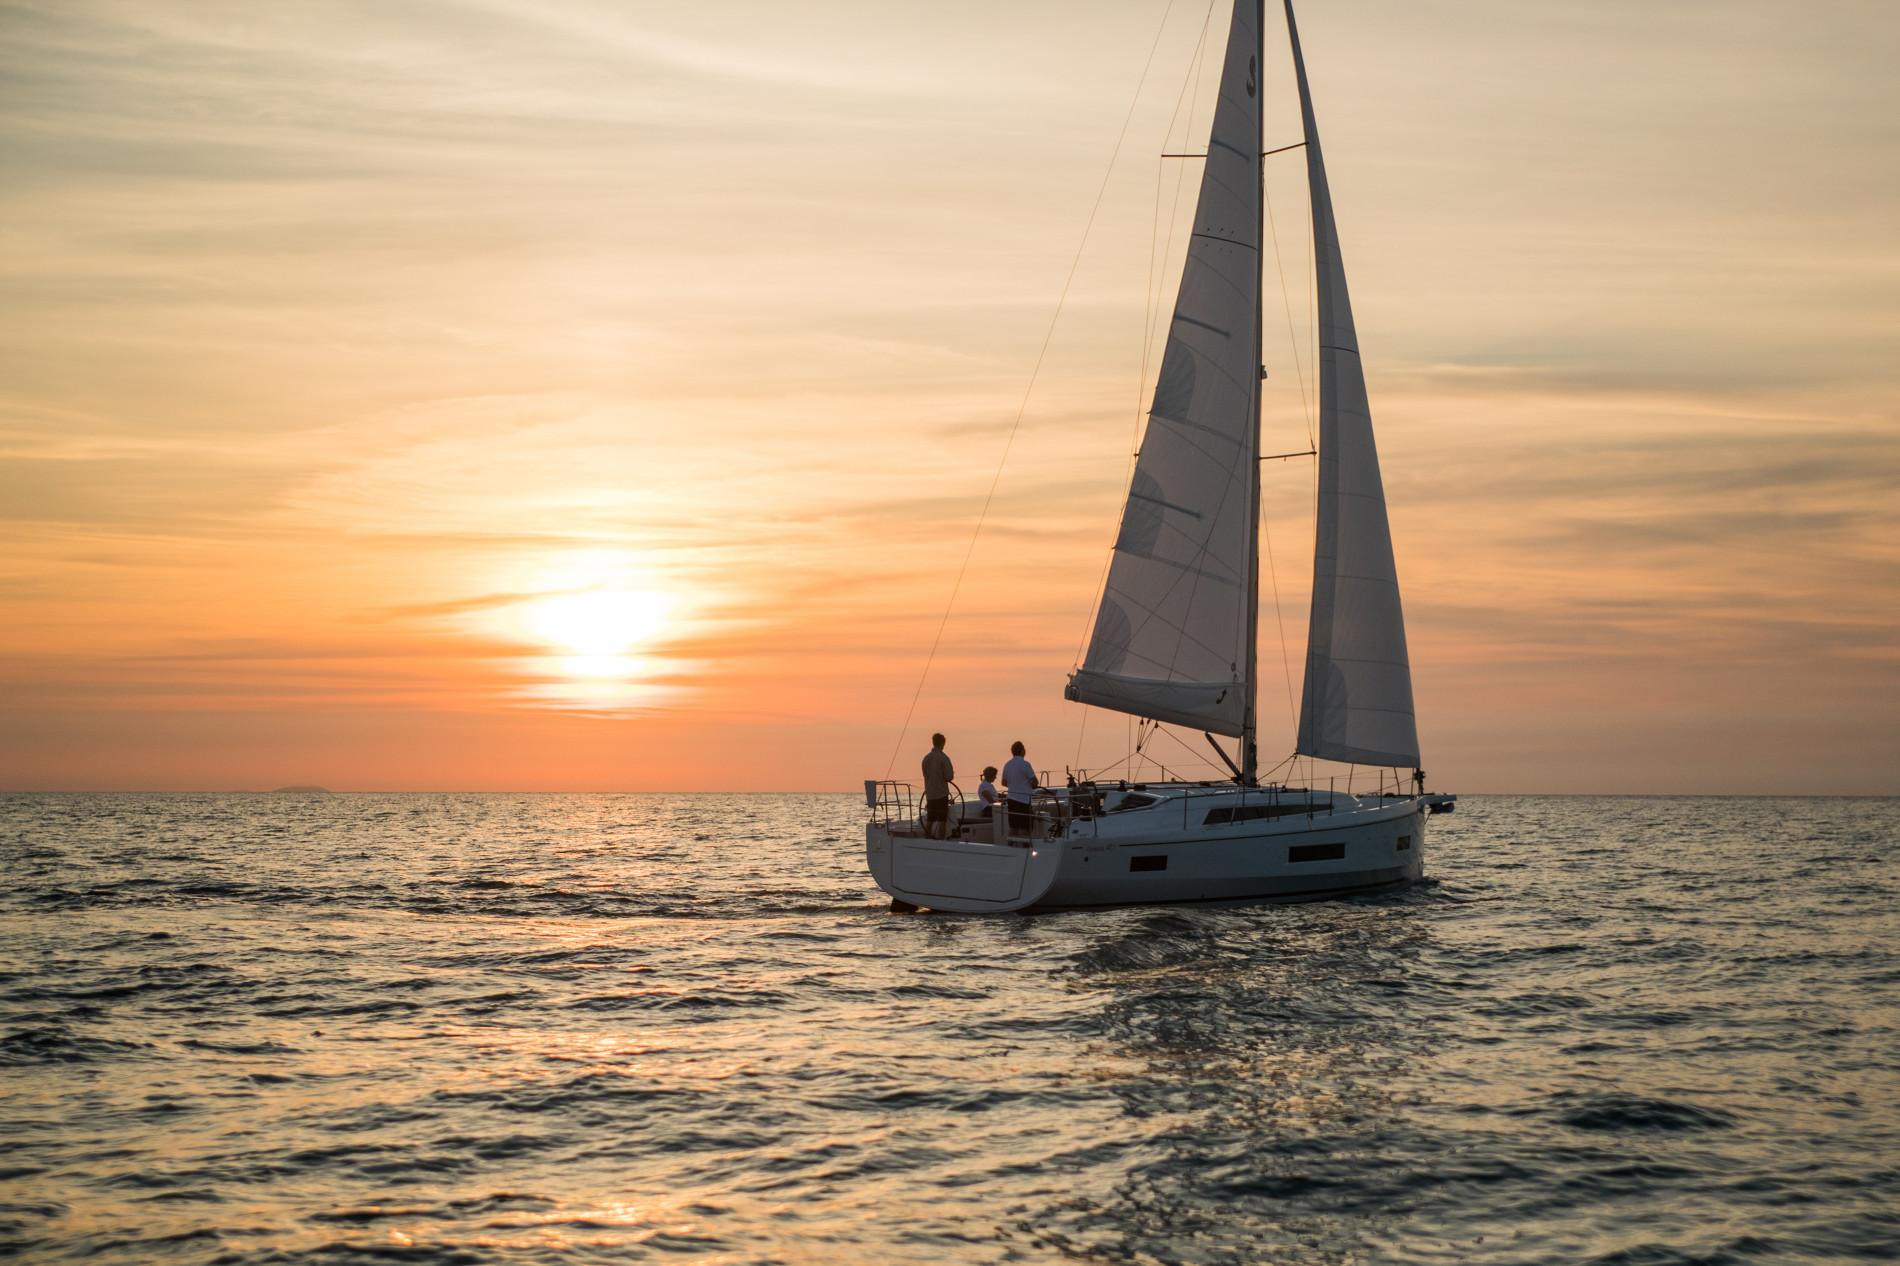 Beneteau Oceanis 40.1 — Full Beam Cruising